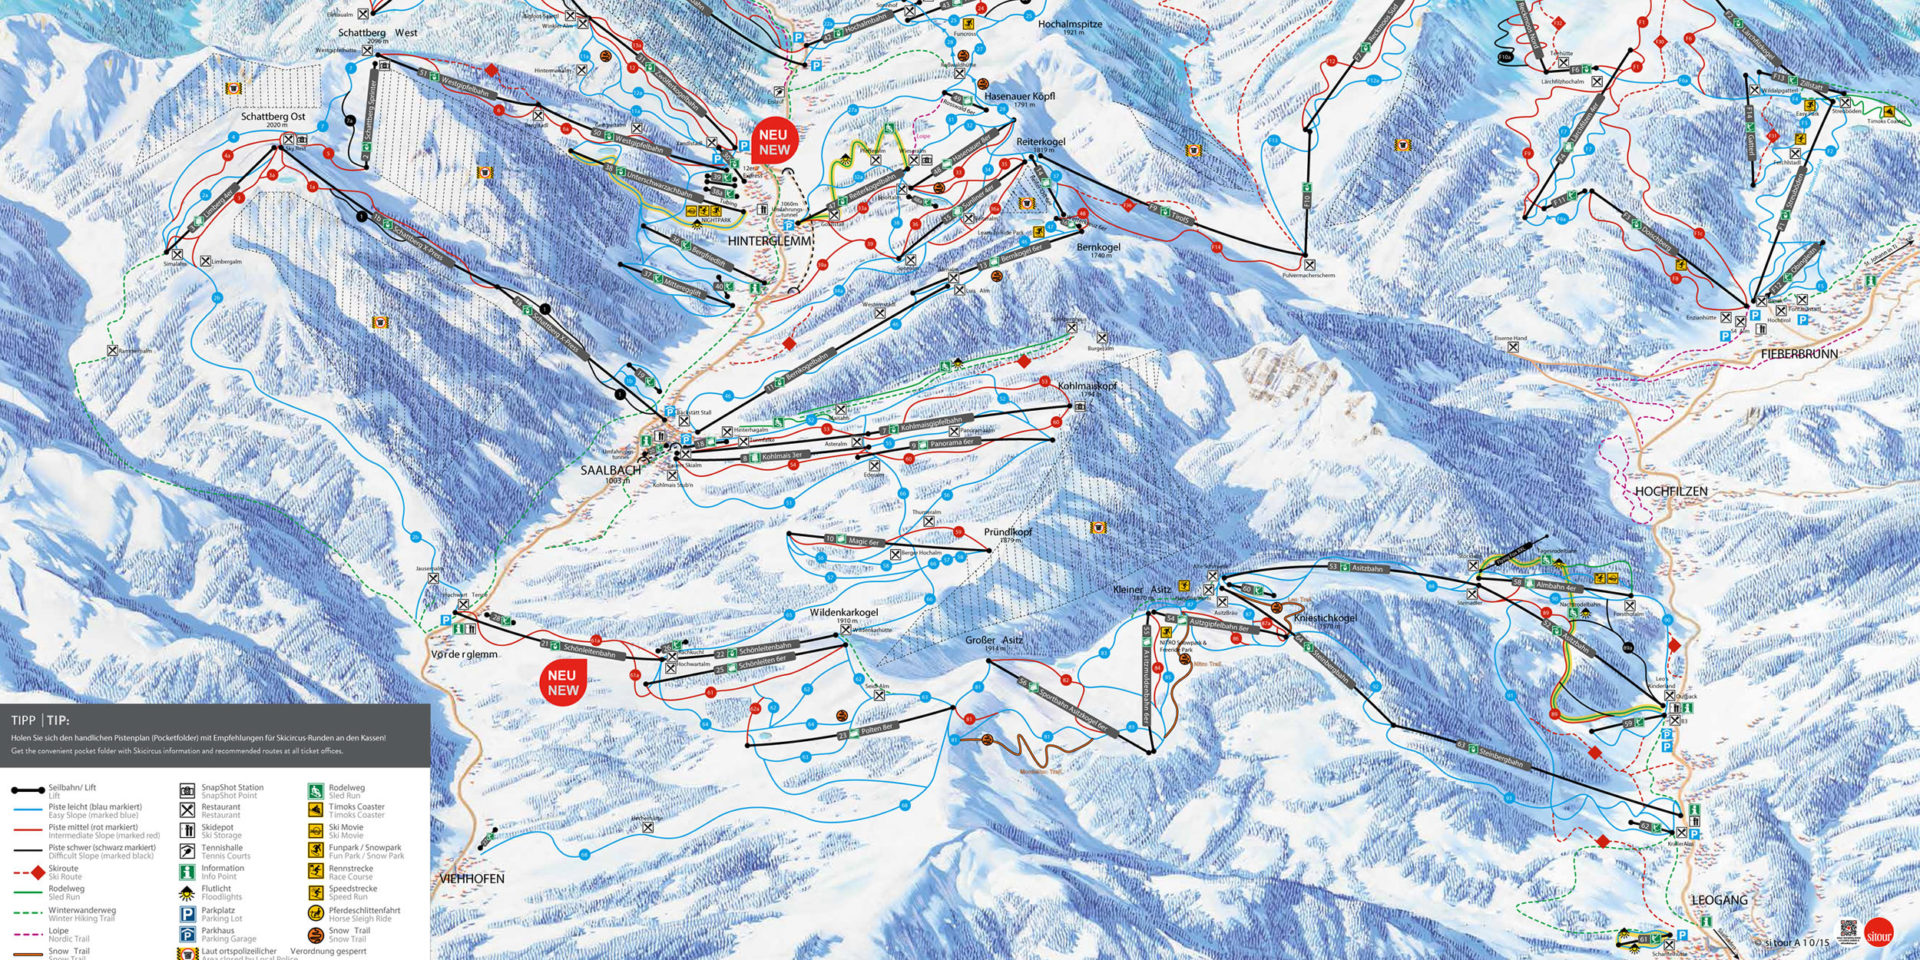 Pisteplattegrond Skicircus Saalbach Hinterglemm Leogang Fieberbunn Oostenrijk